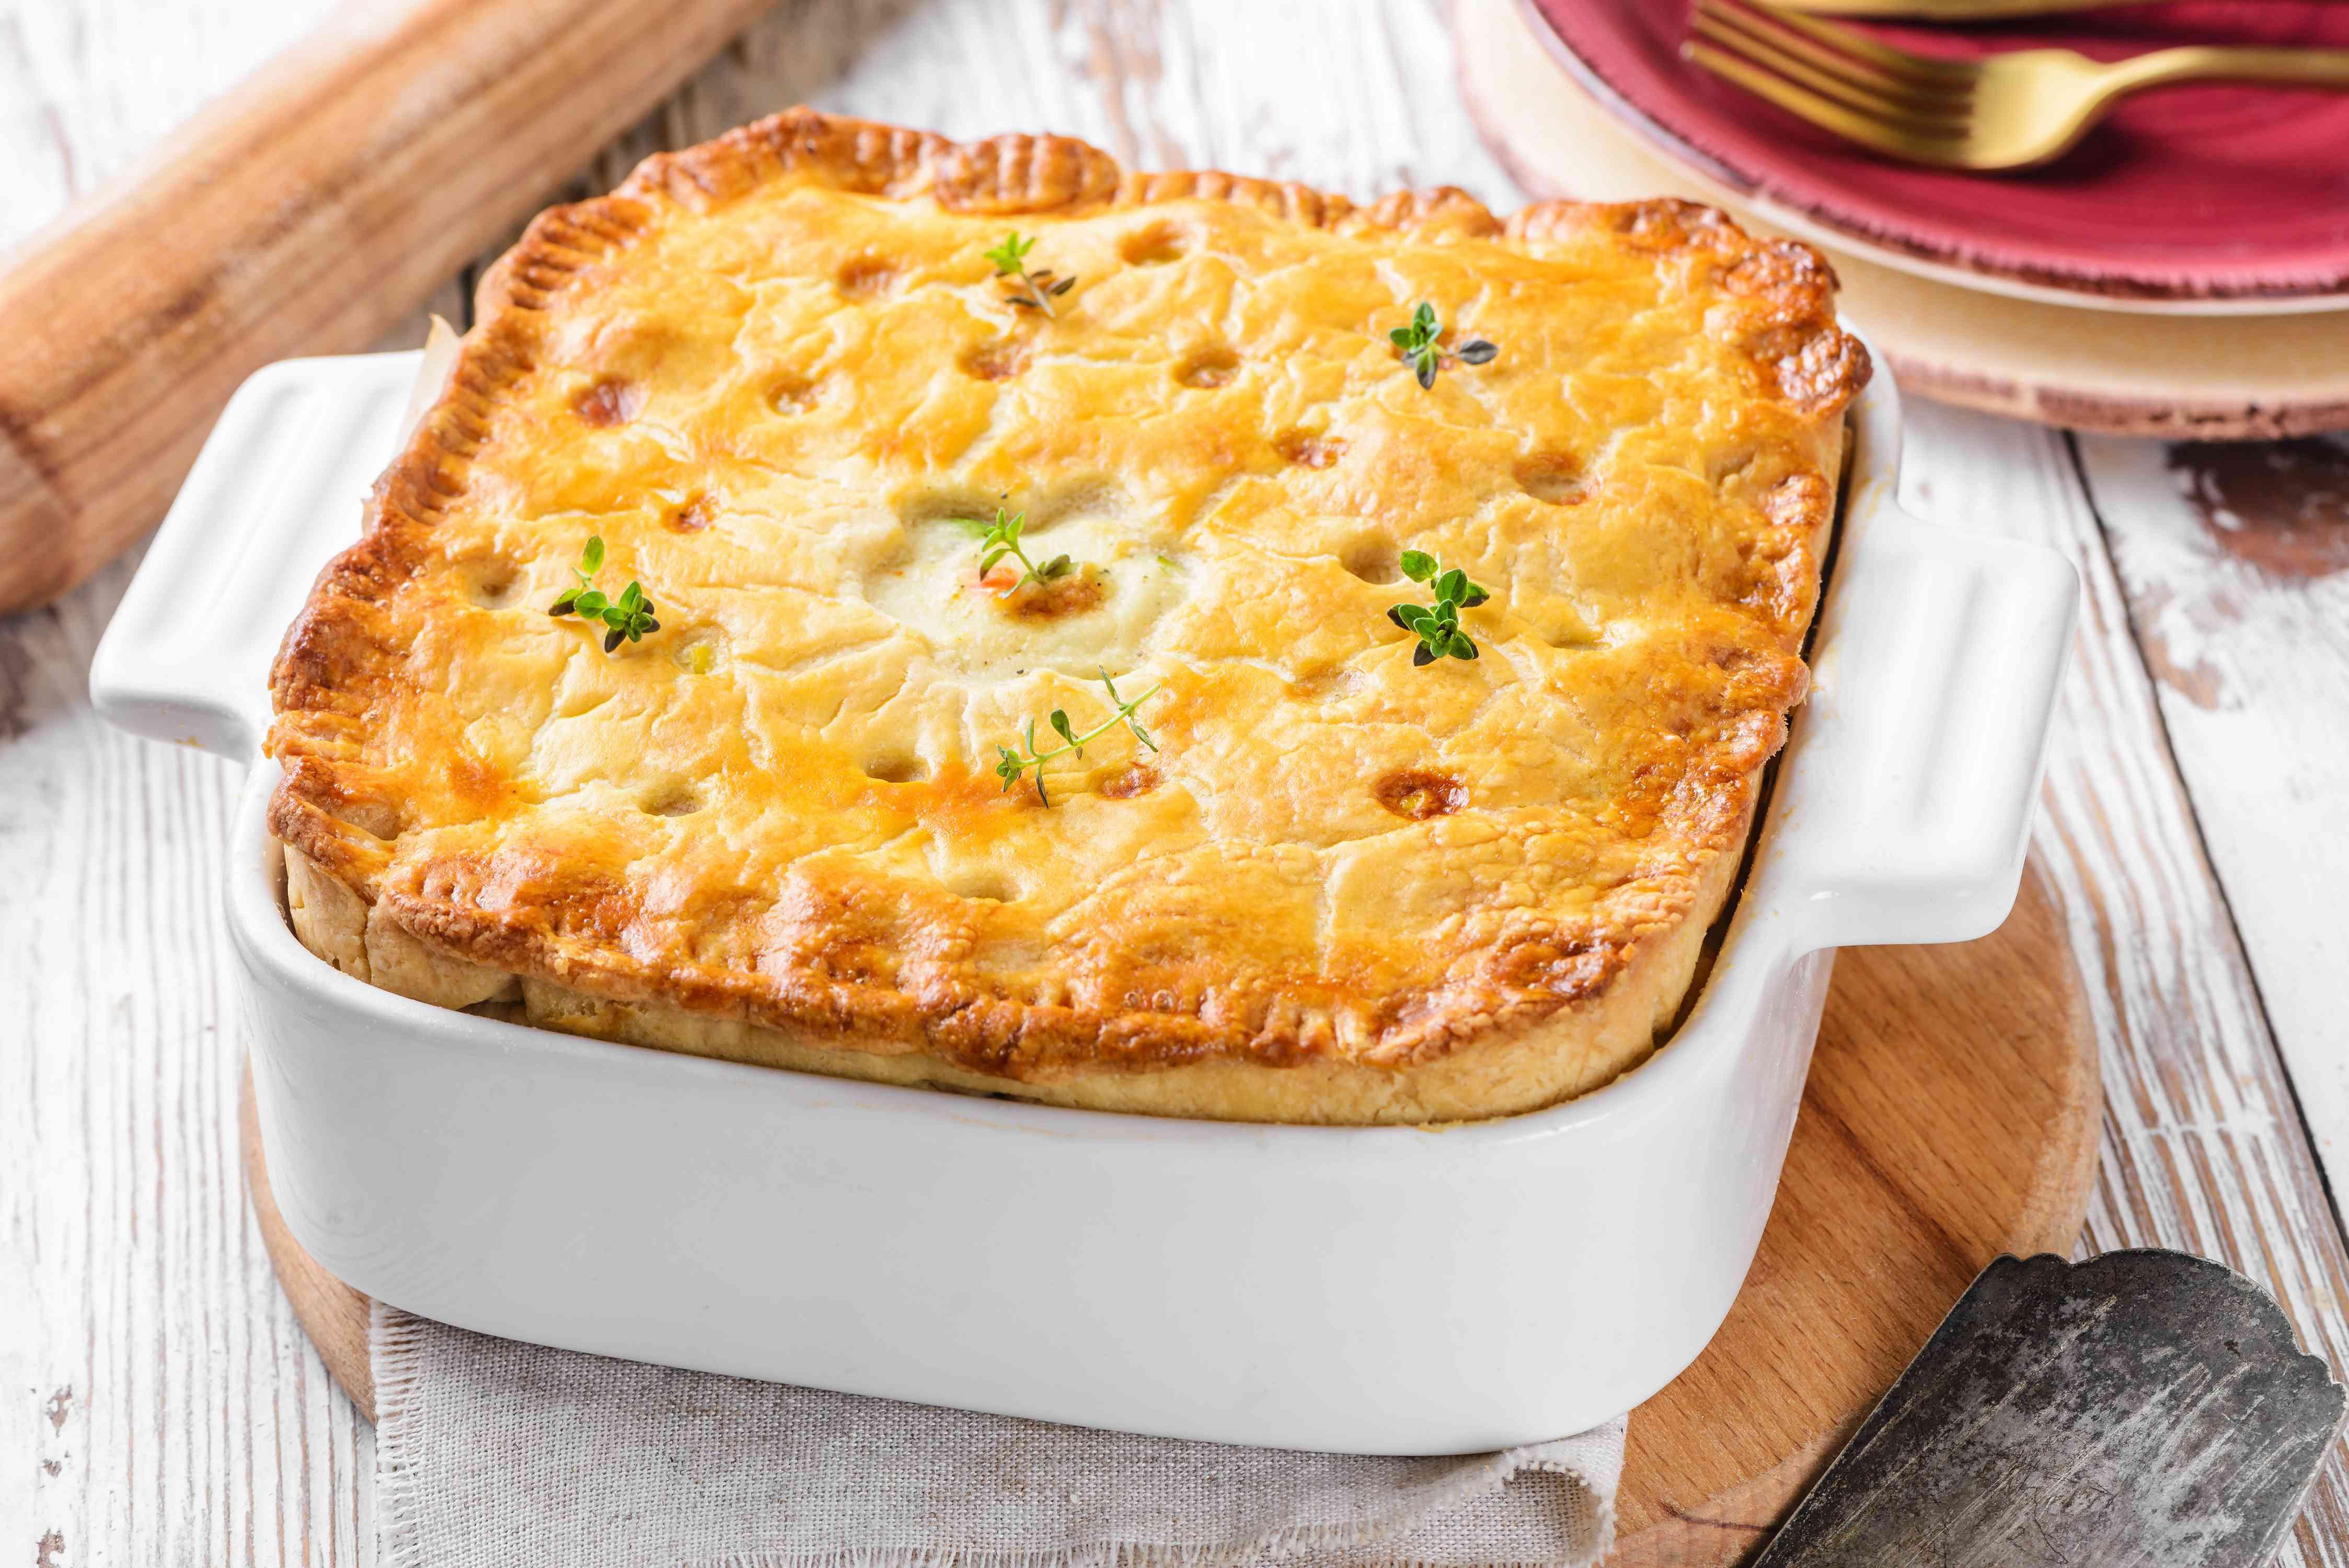 Turkey pot pie encased in pastry dough